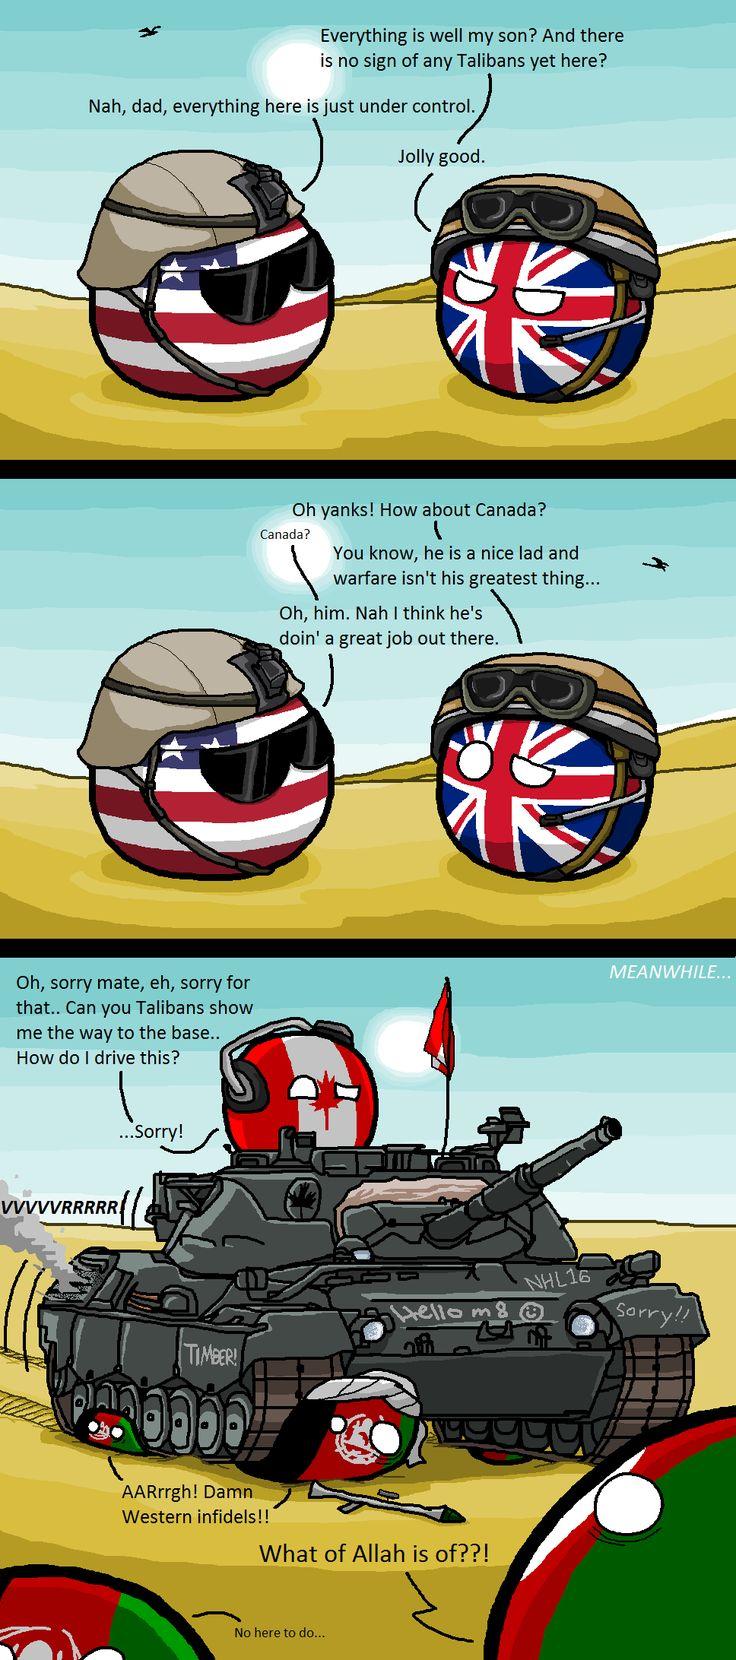 Canadian Reinforcement ( USA, UK, Canada ) by Kaliningrad General  #polandball #countryball